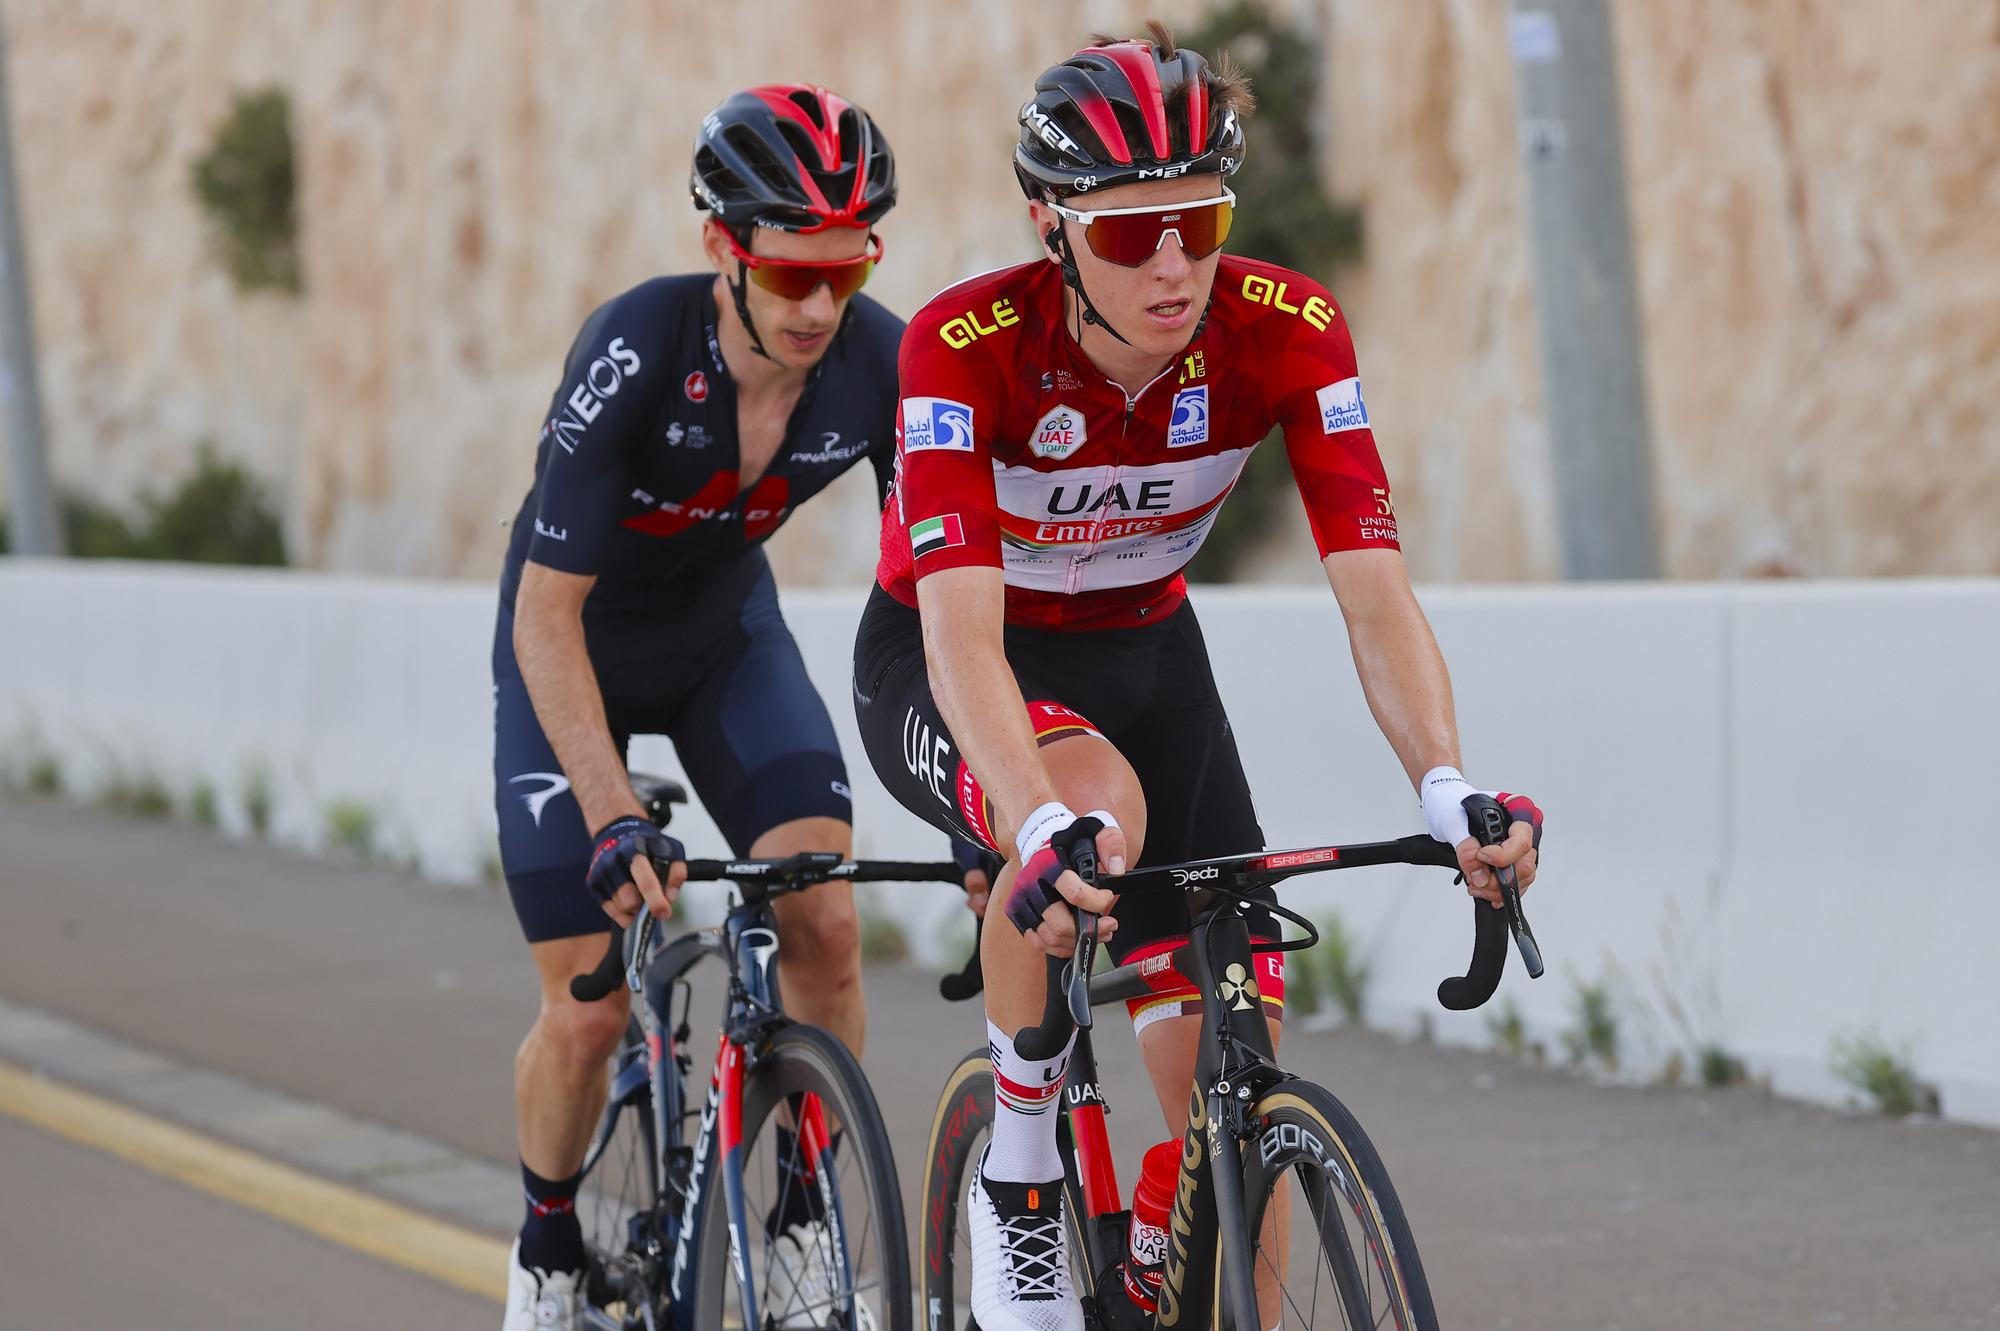 Tadej Pogacar leads Adam Yates on the climb